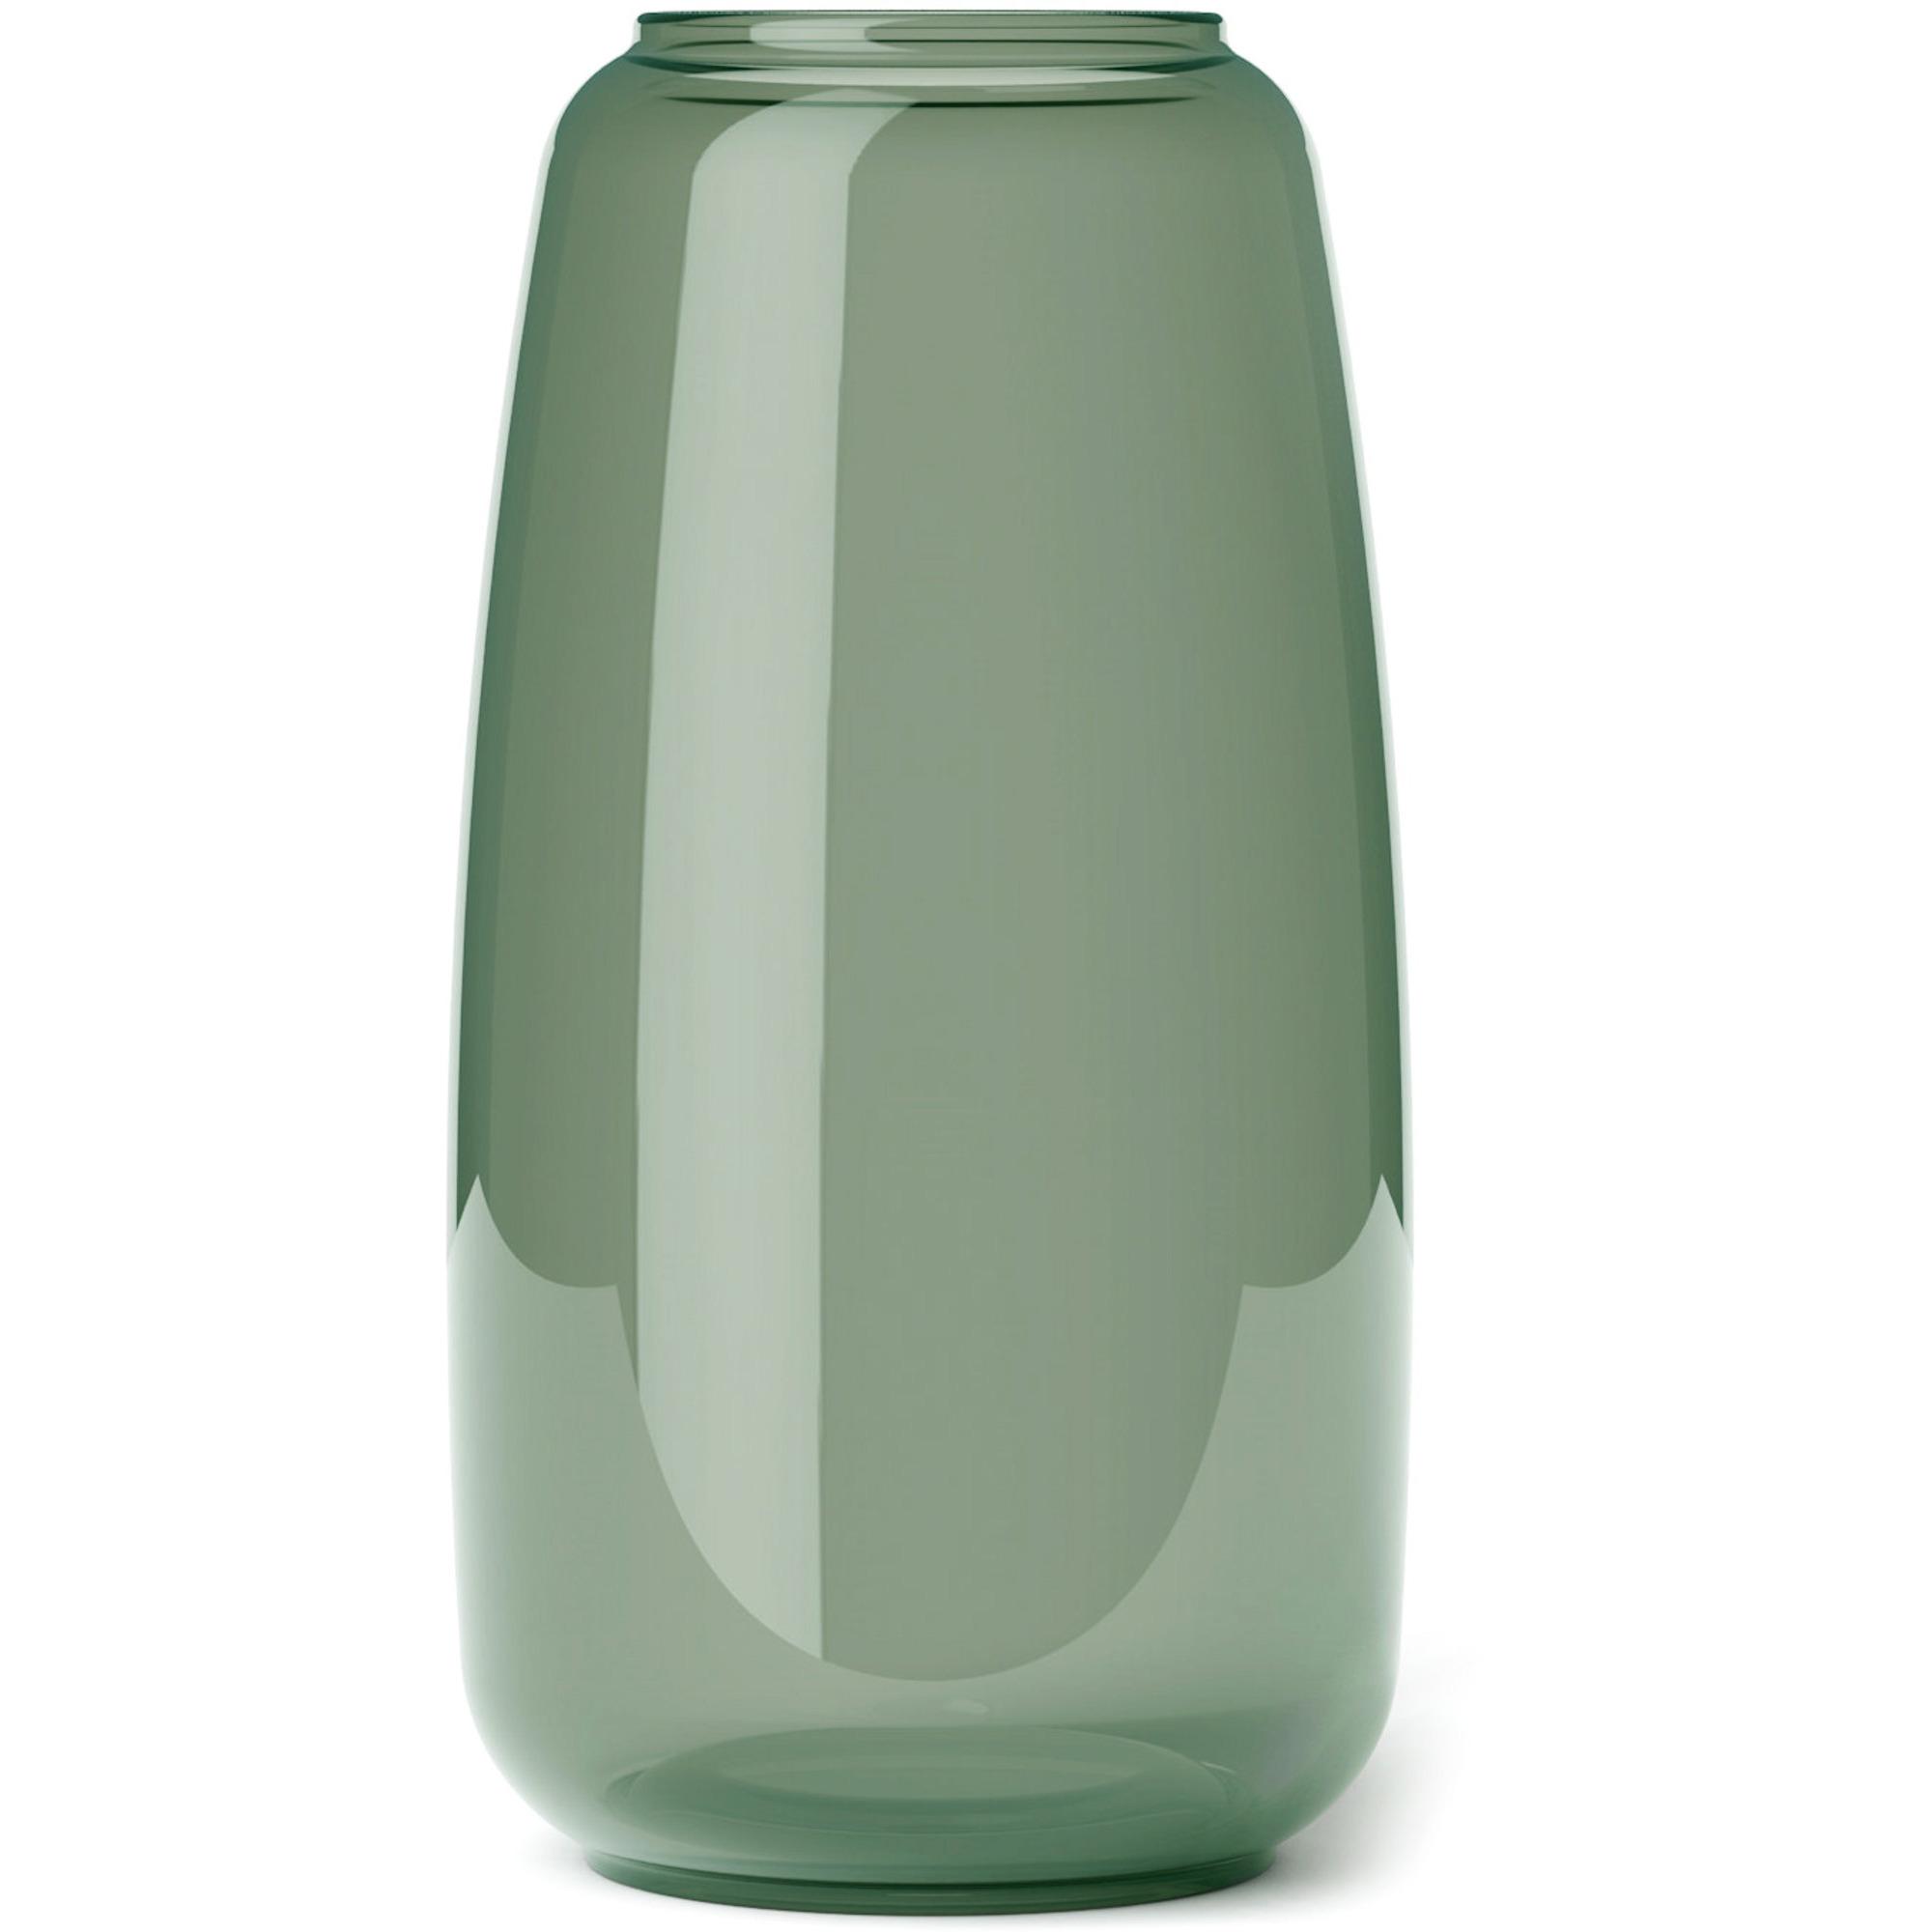 Lyngby Porcelæn Form 130/3 H 22 cm. Copenhagen grön